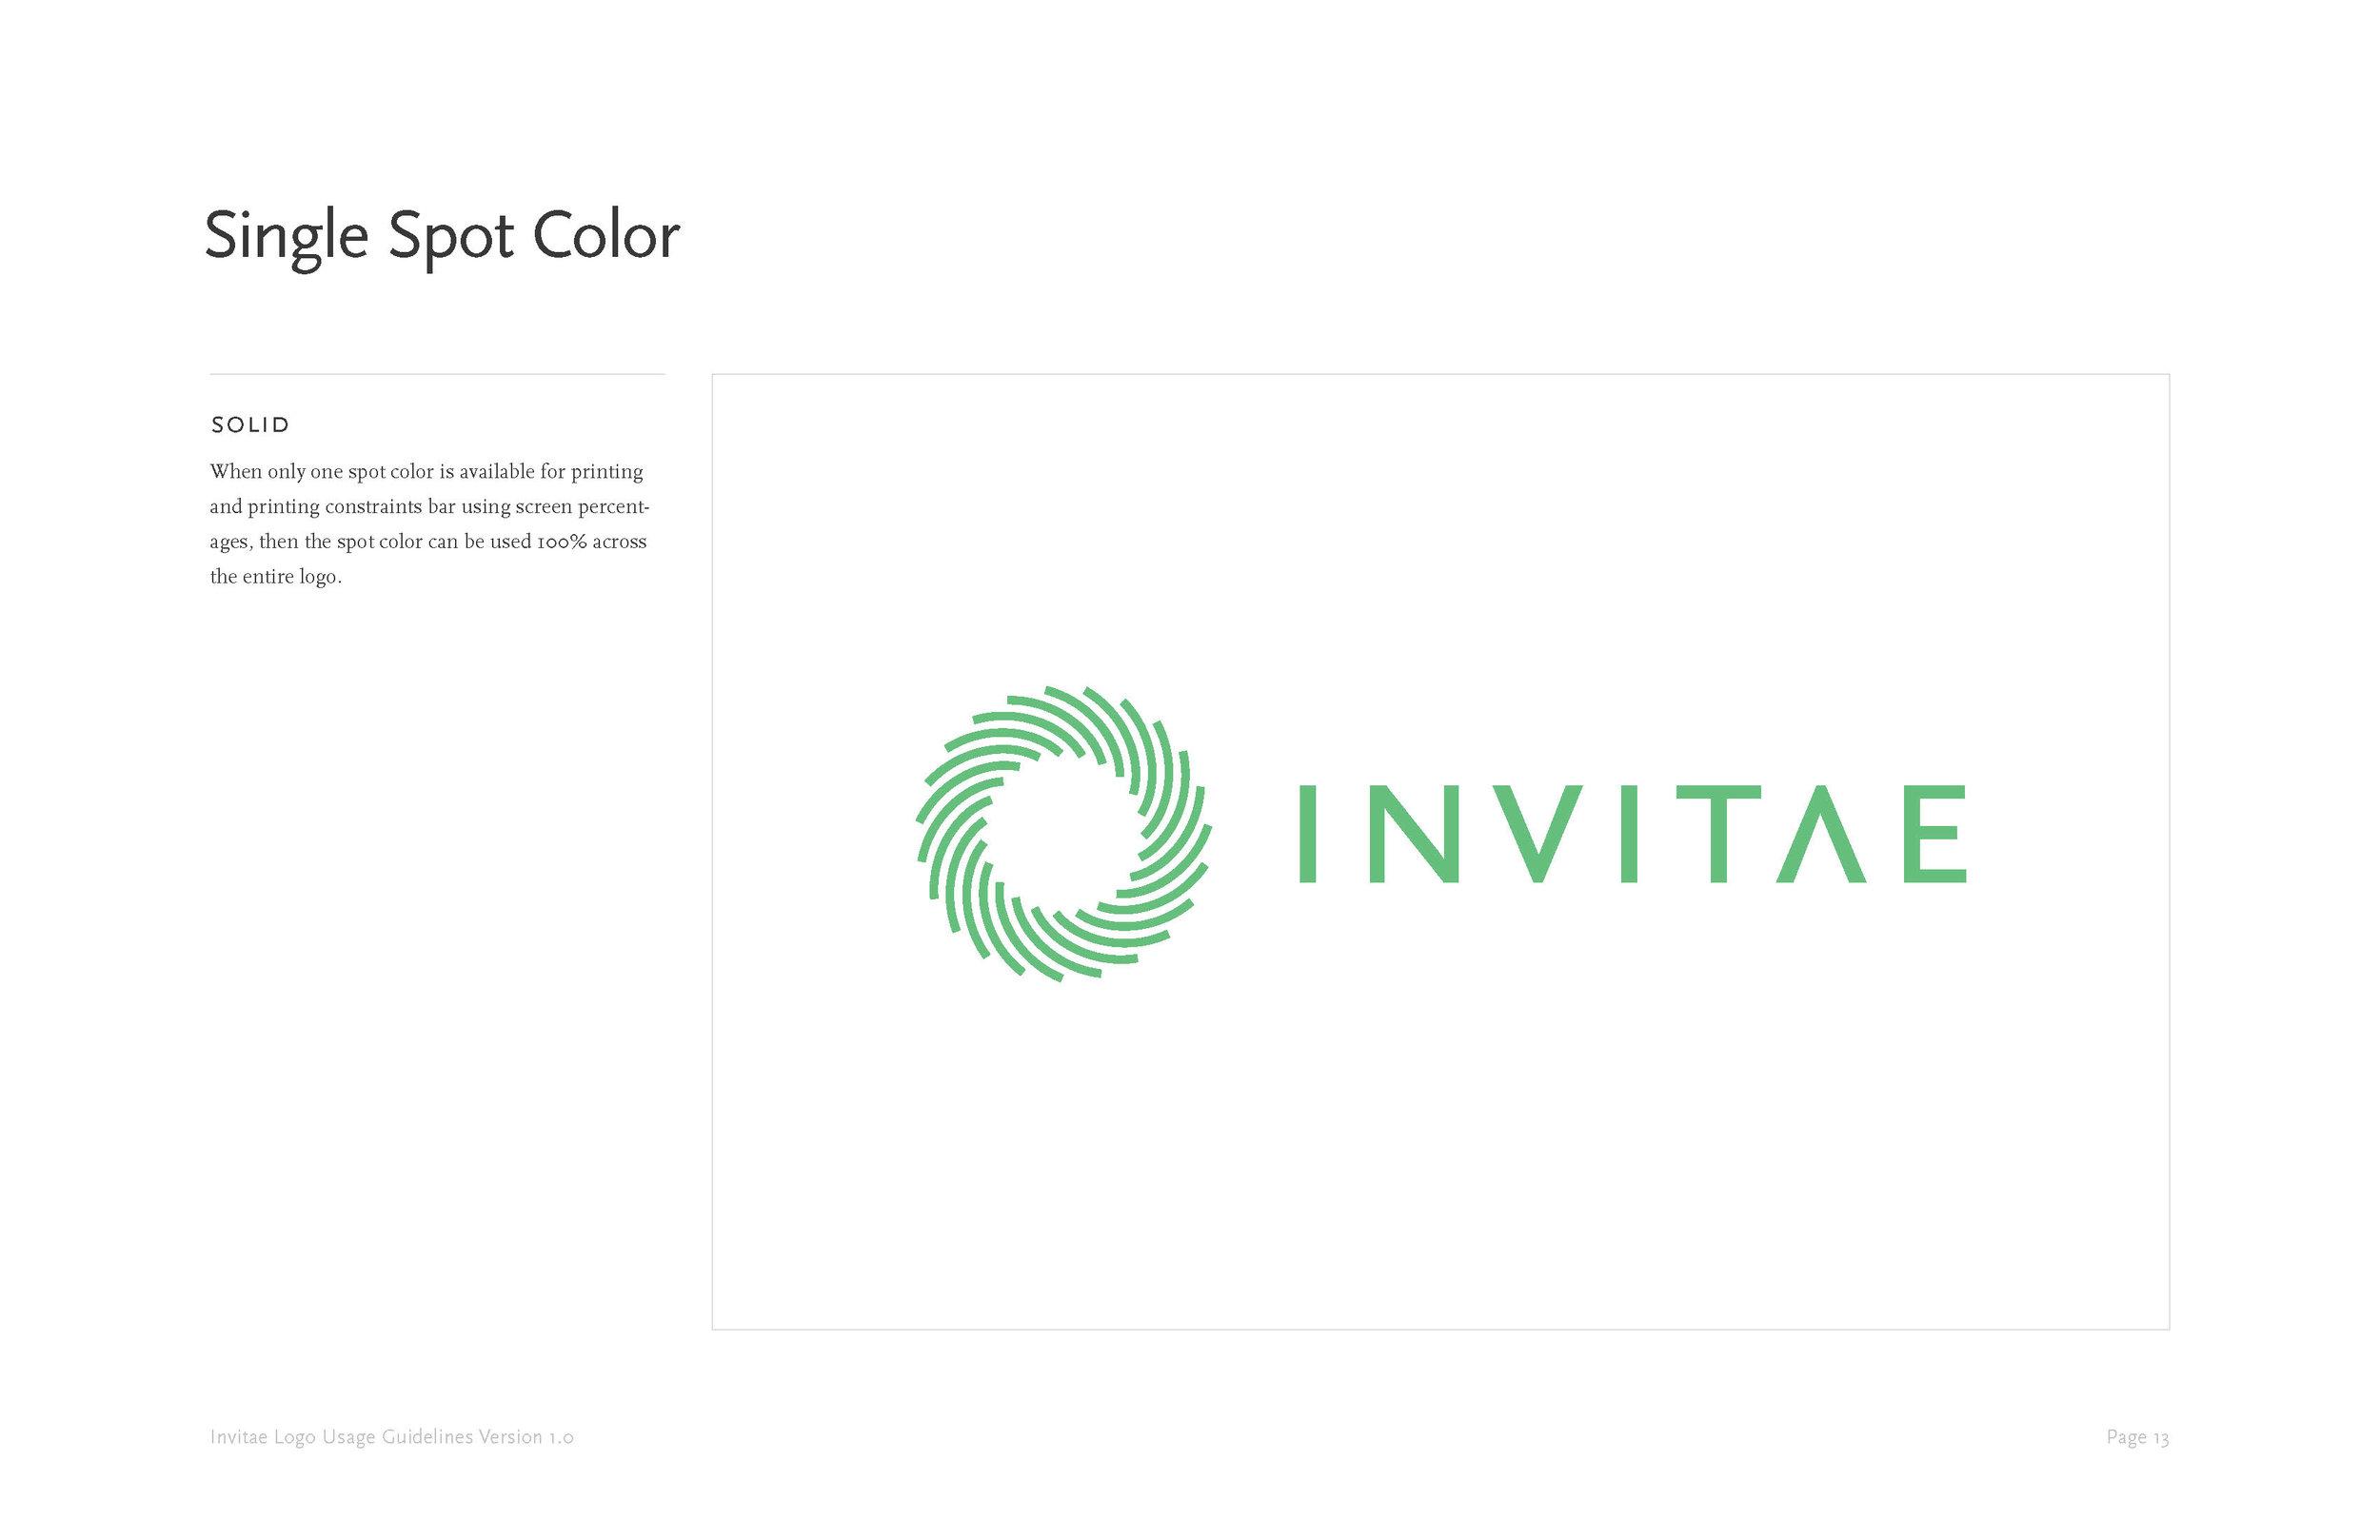 Invitae_logo_guidelines_Page_15.jpg